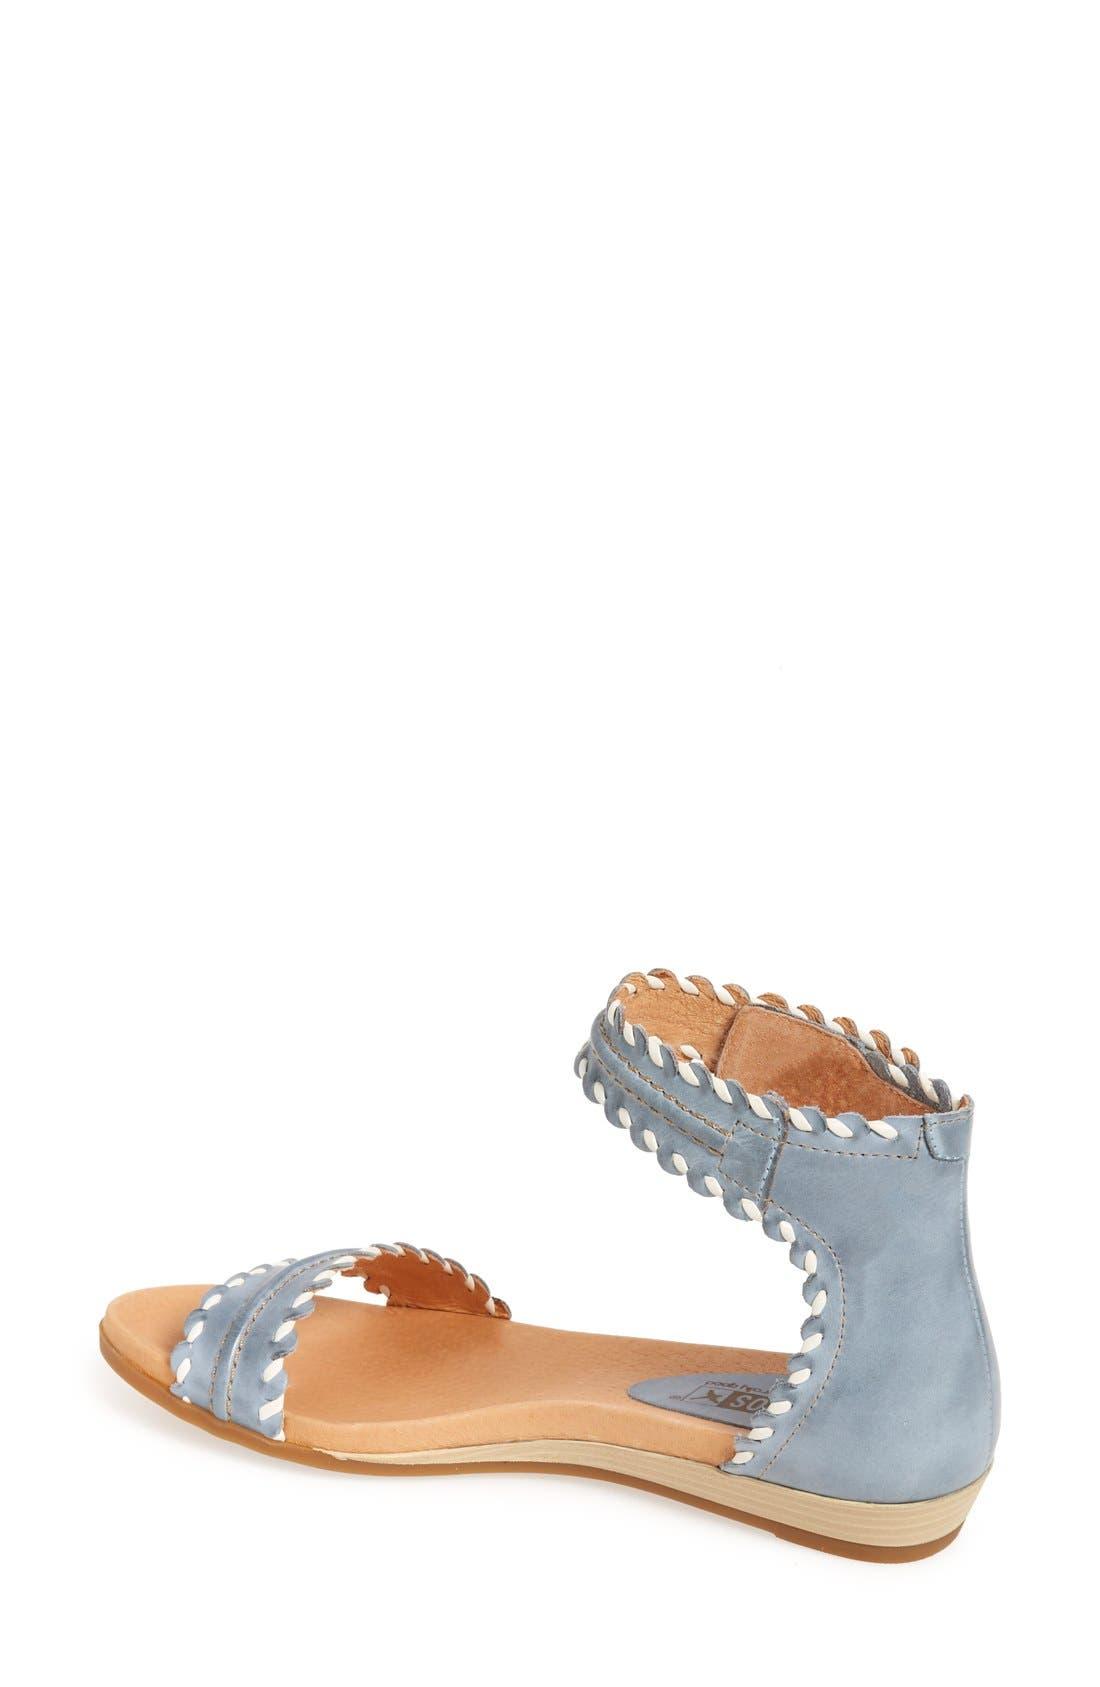 'Alcudia' Ankle Strap Sandal,                             Alternate thumbnail 2, color,                             Denim Leather